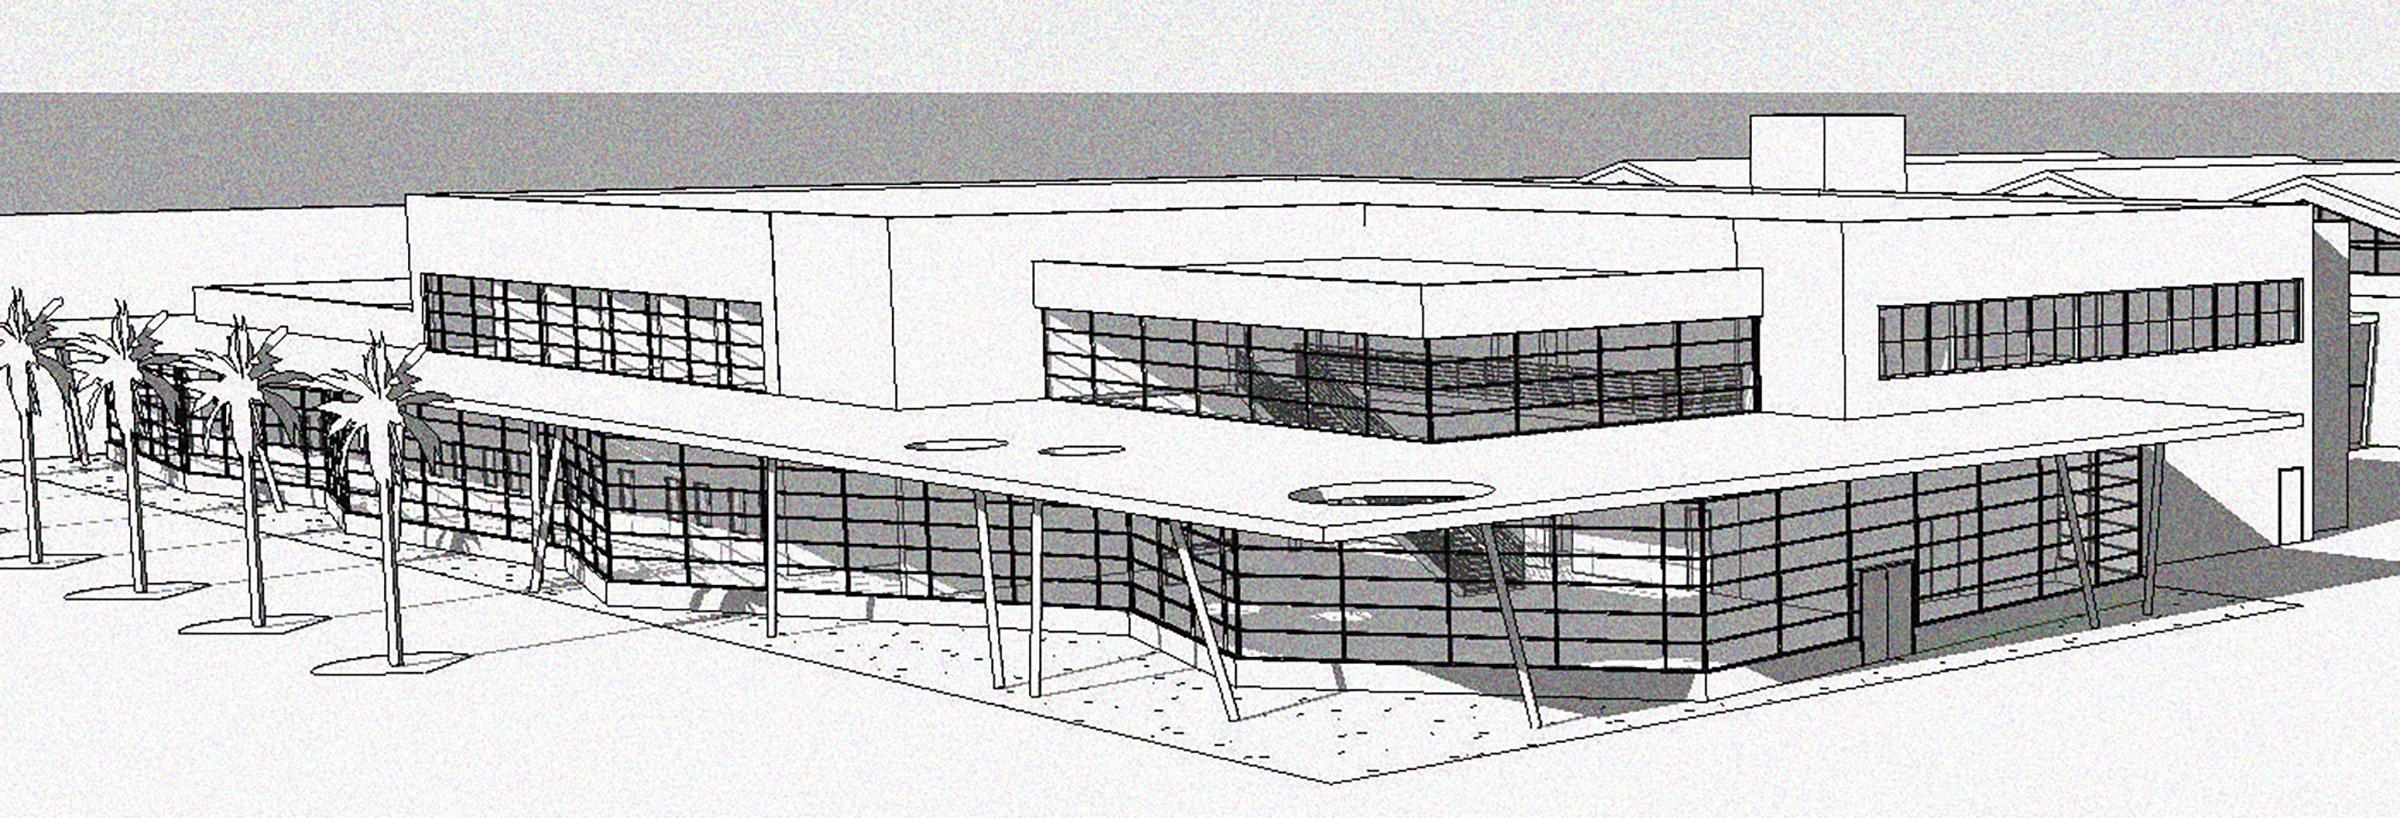 FWC Marine Enhancement Center Prototype 2